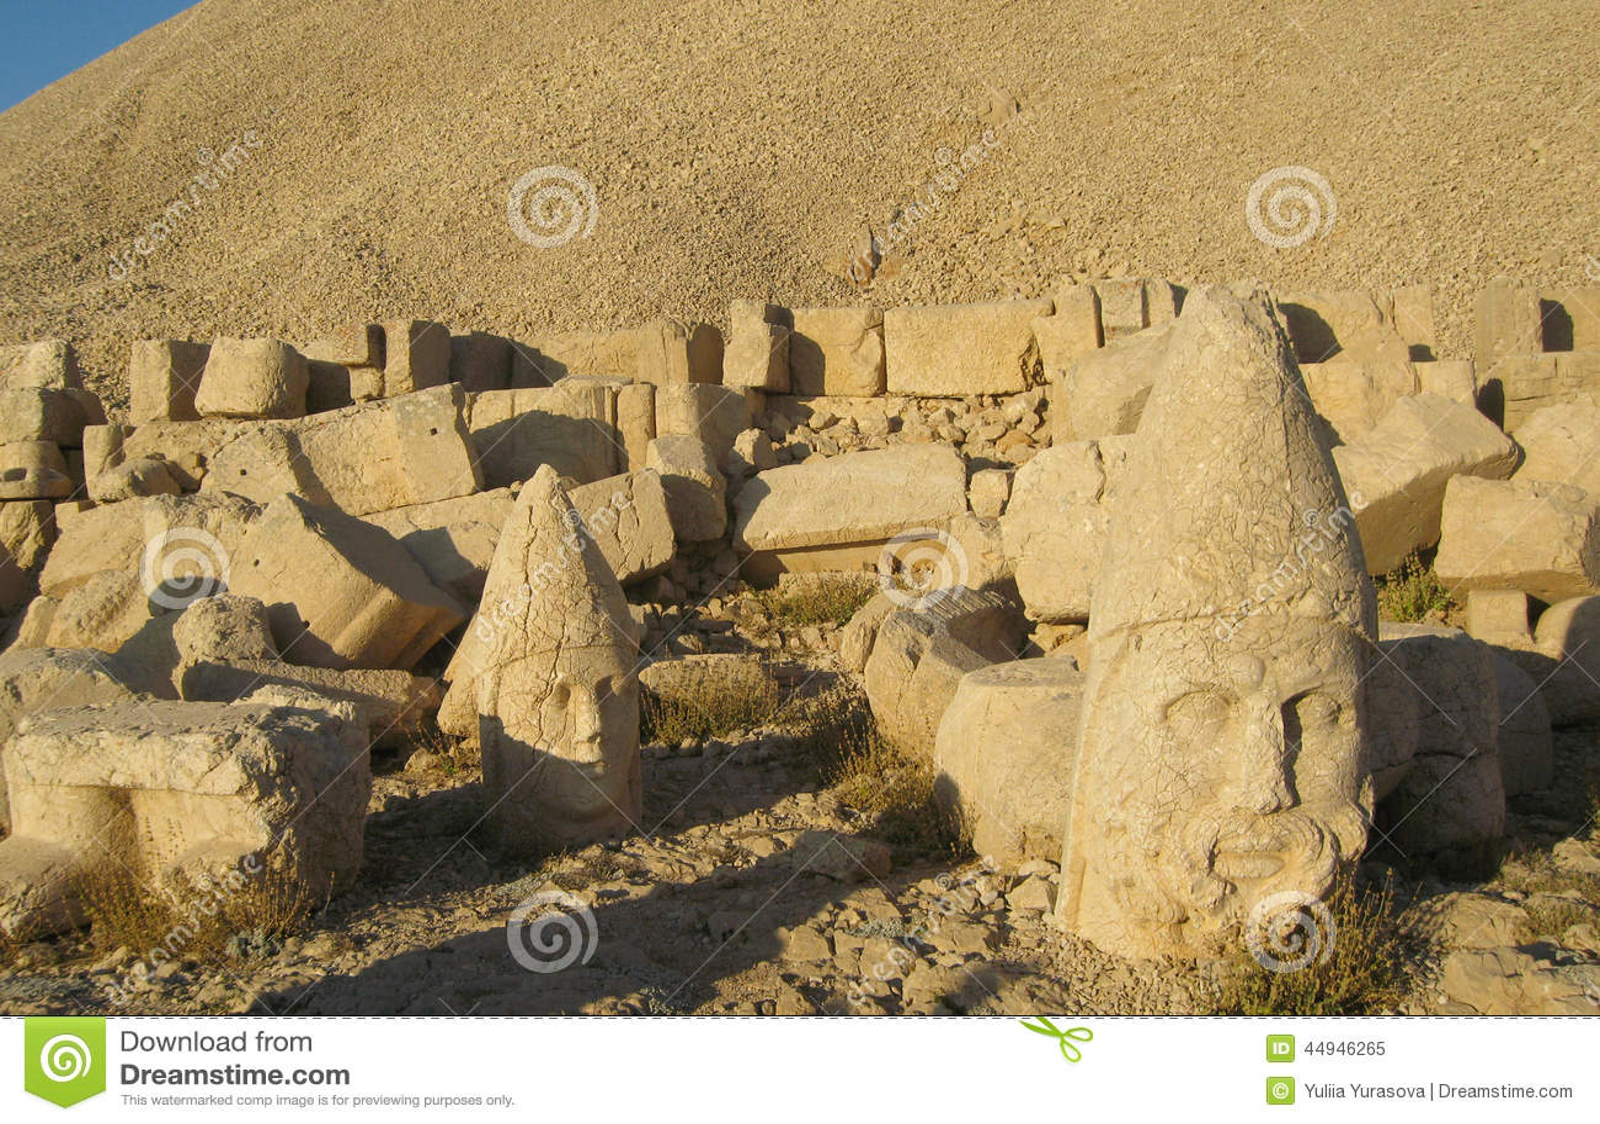 Nemrut Dagı Milli Parki, Mount Nemrut with ancient statues heads og the king anf Gods